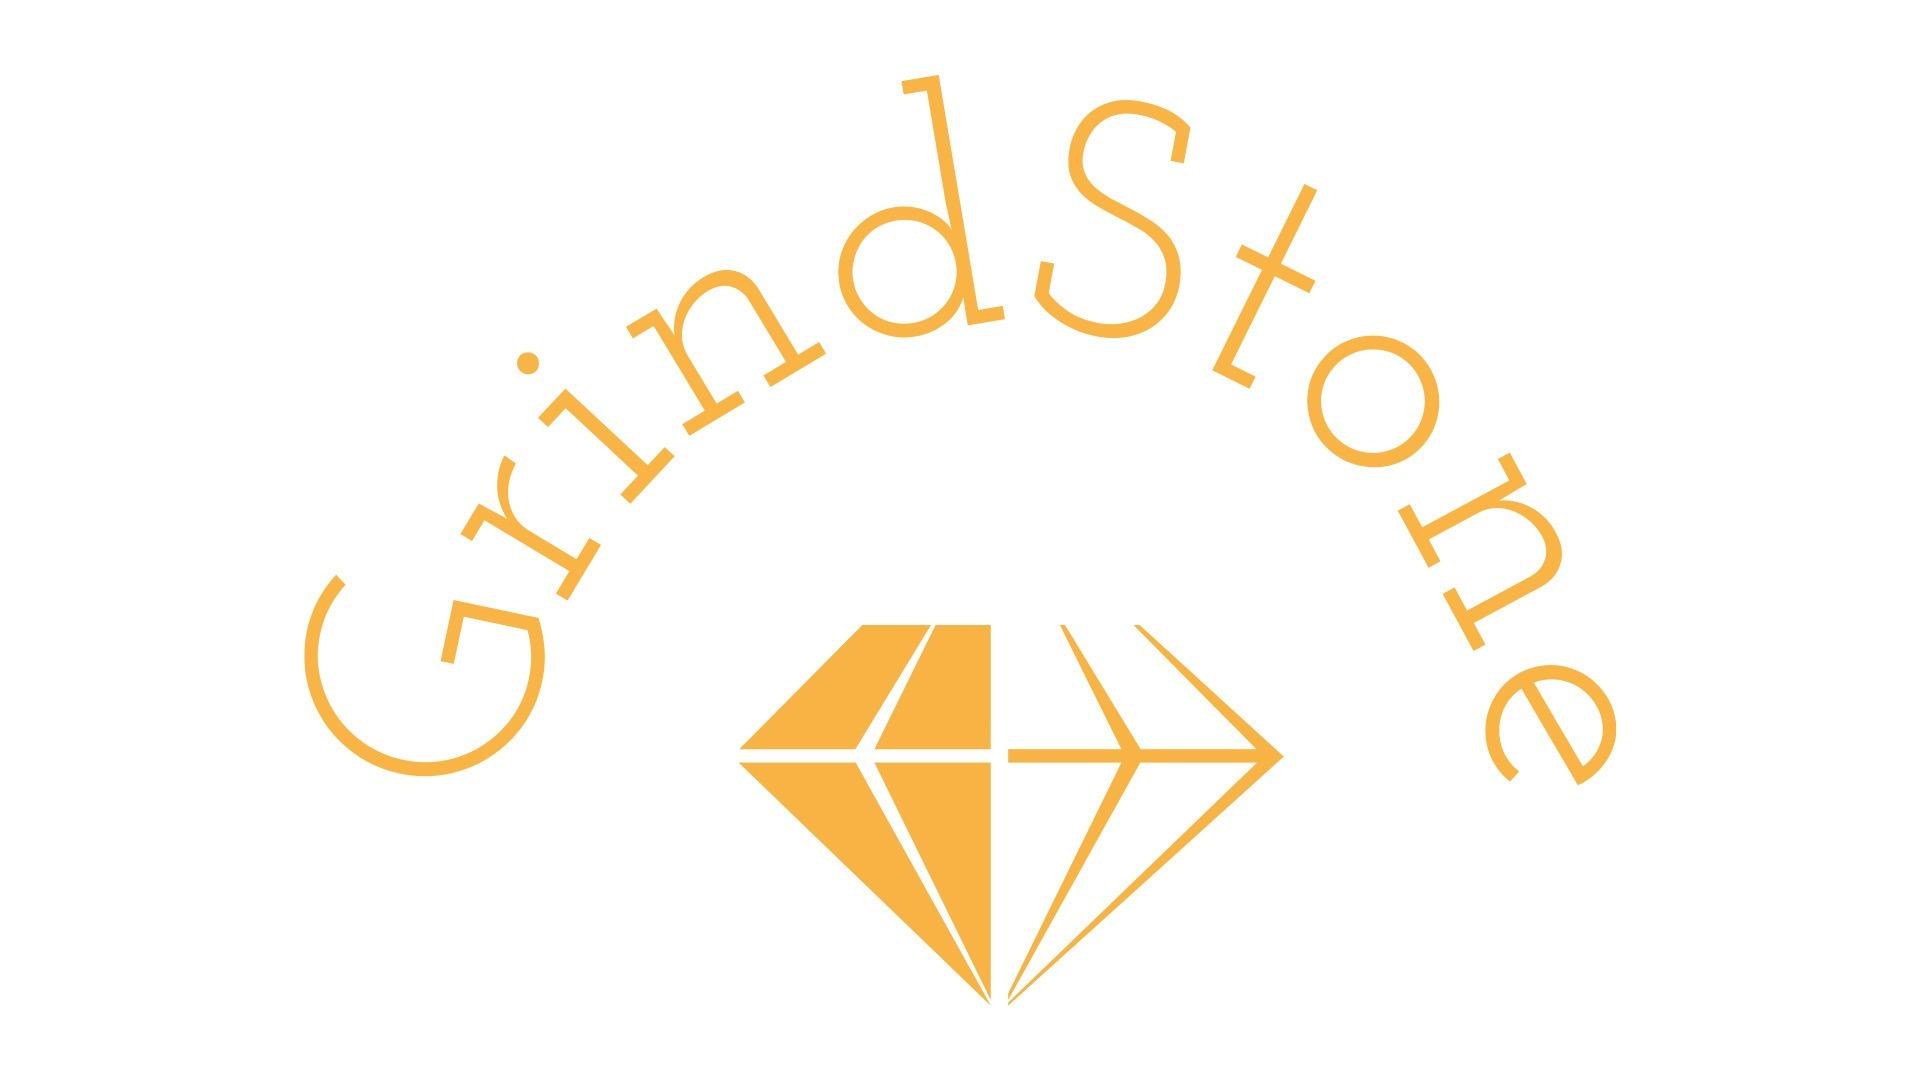 株式会社Grind  Stone